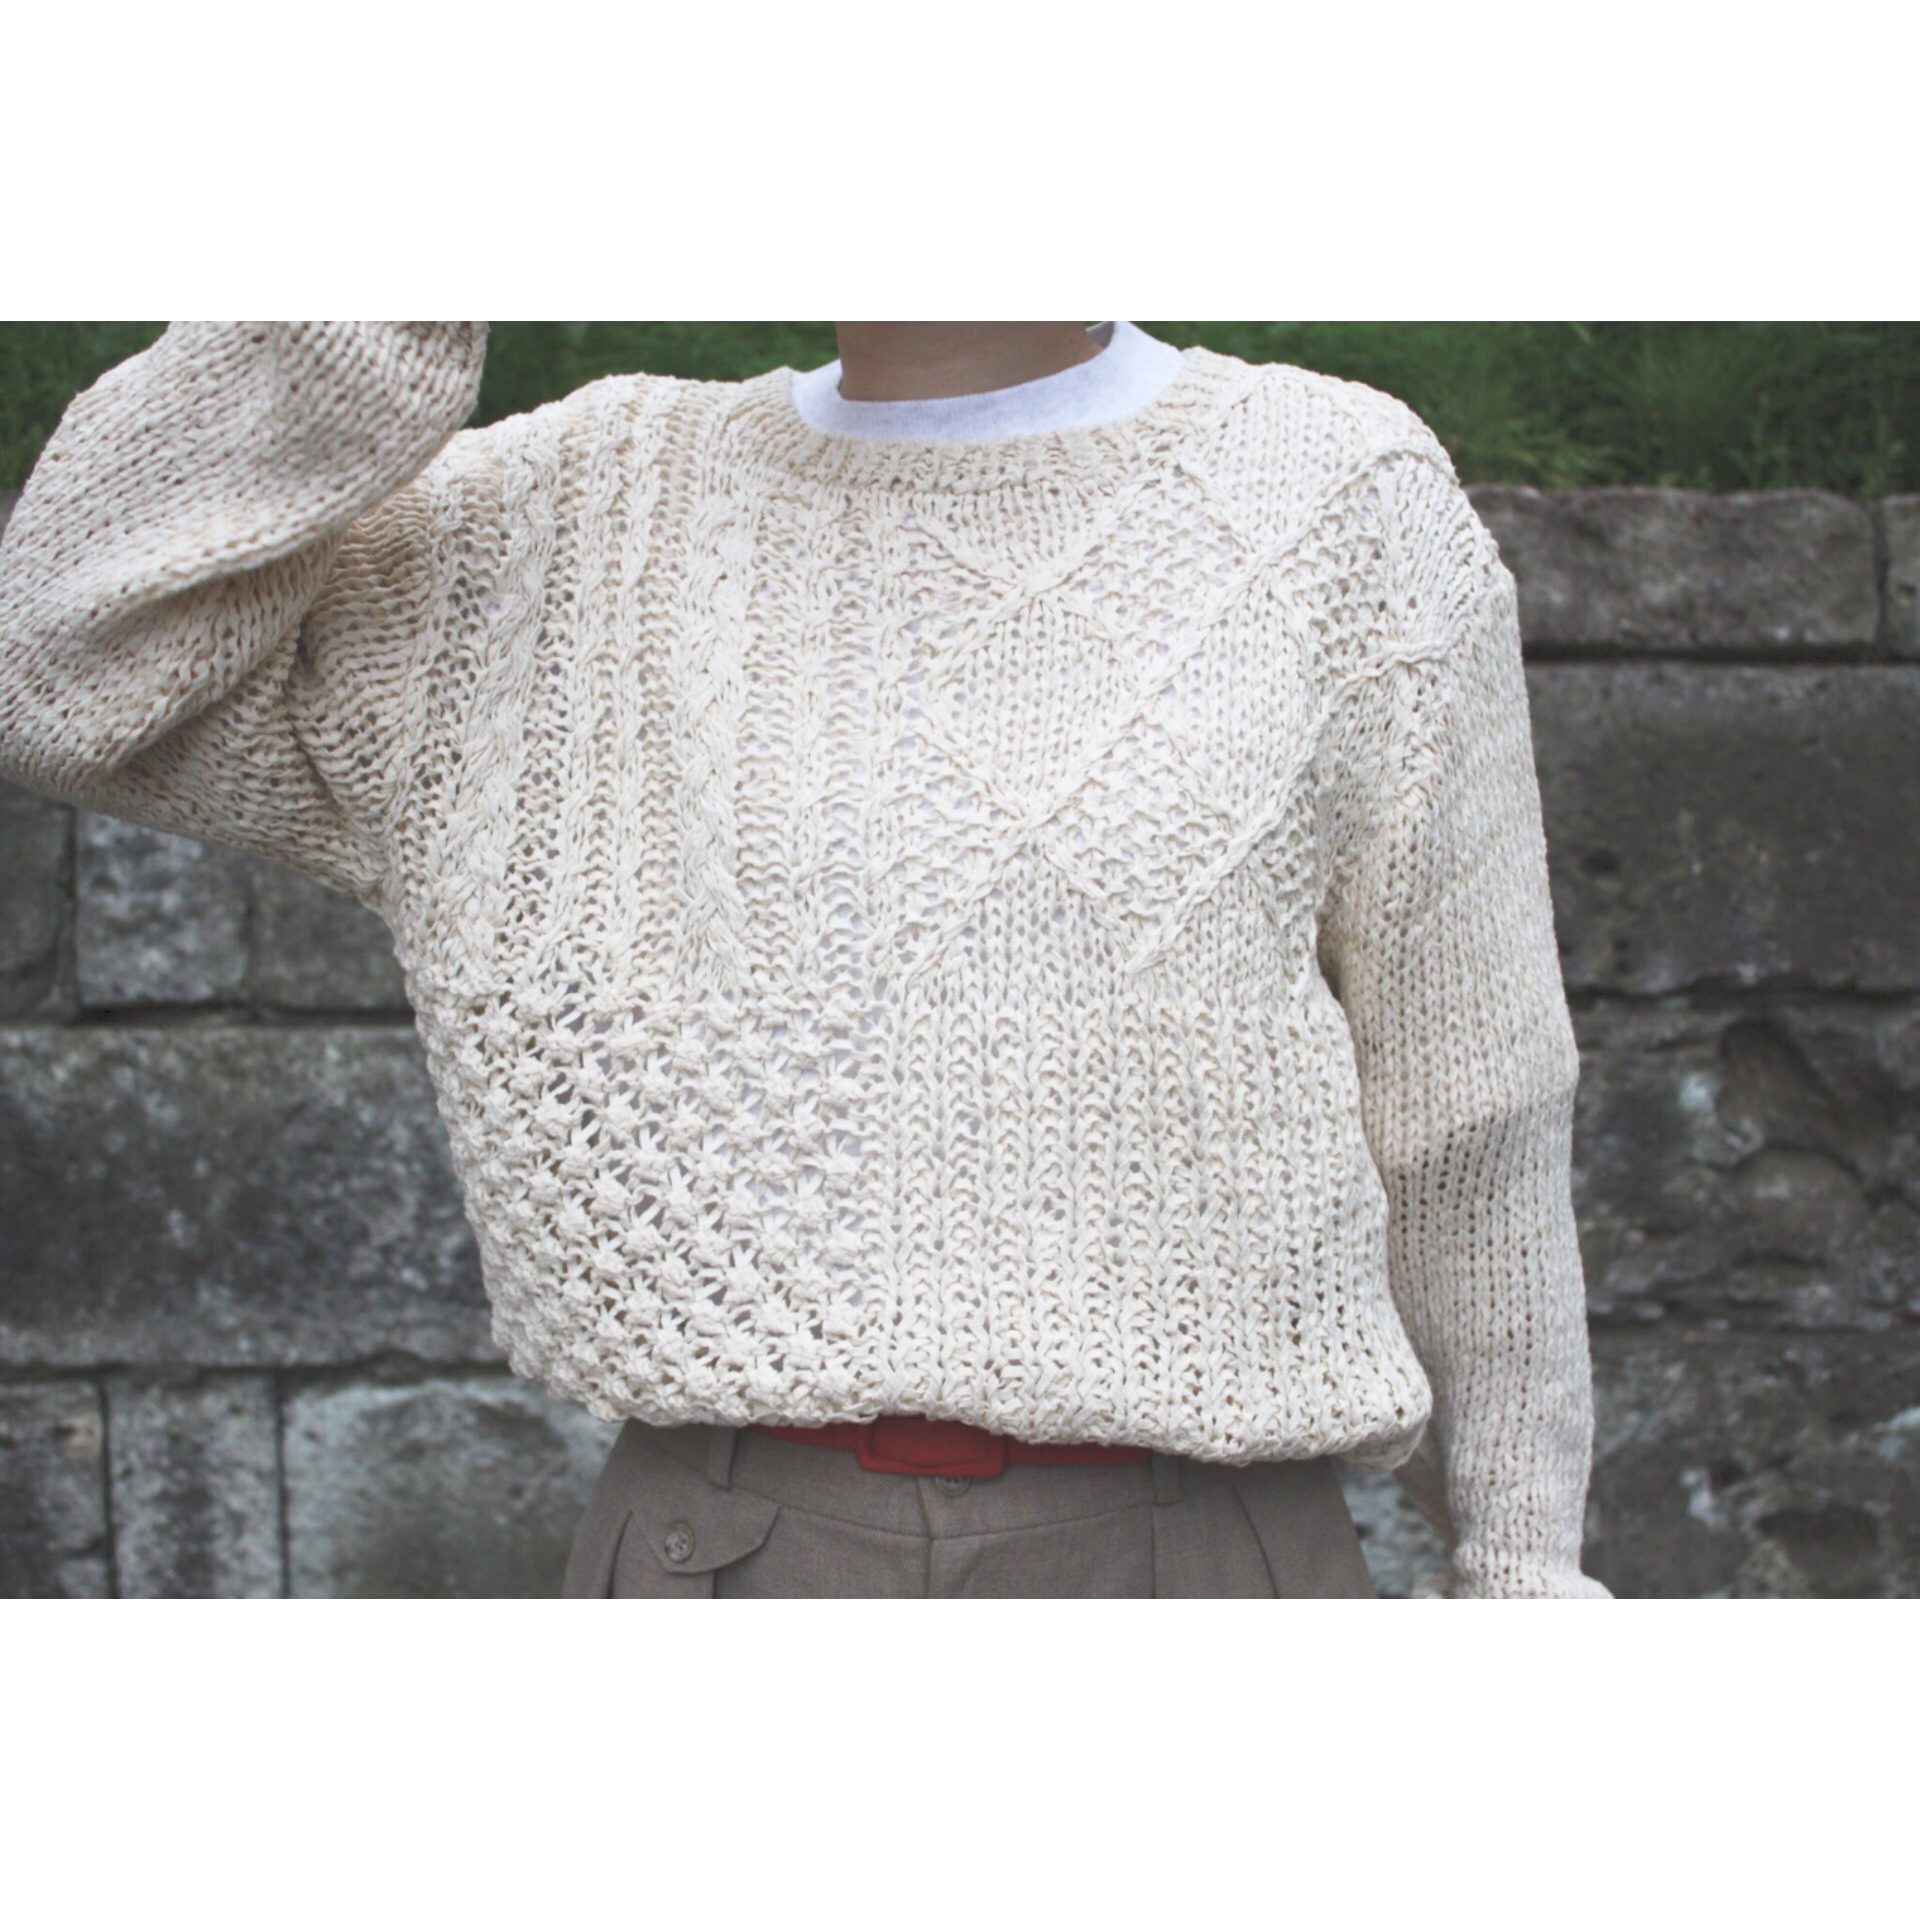 Vintage see through knit